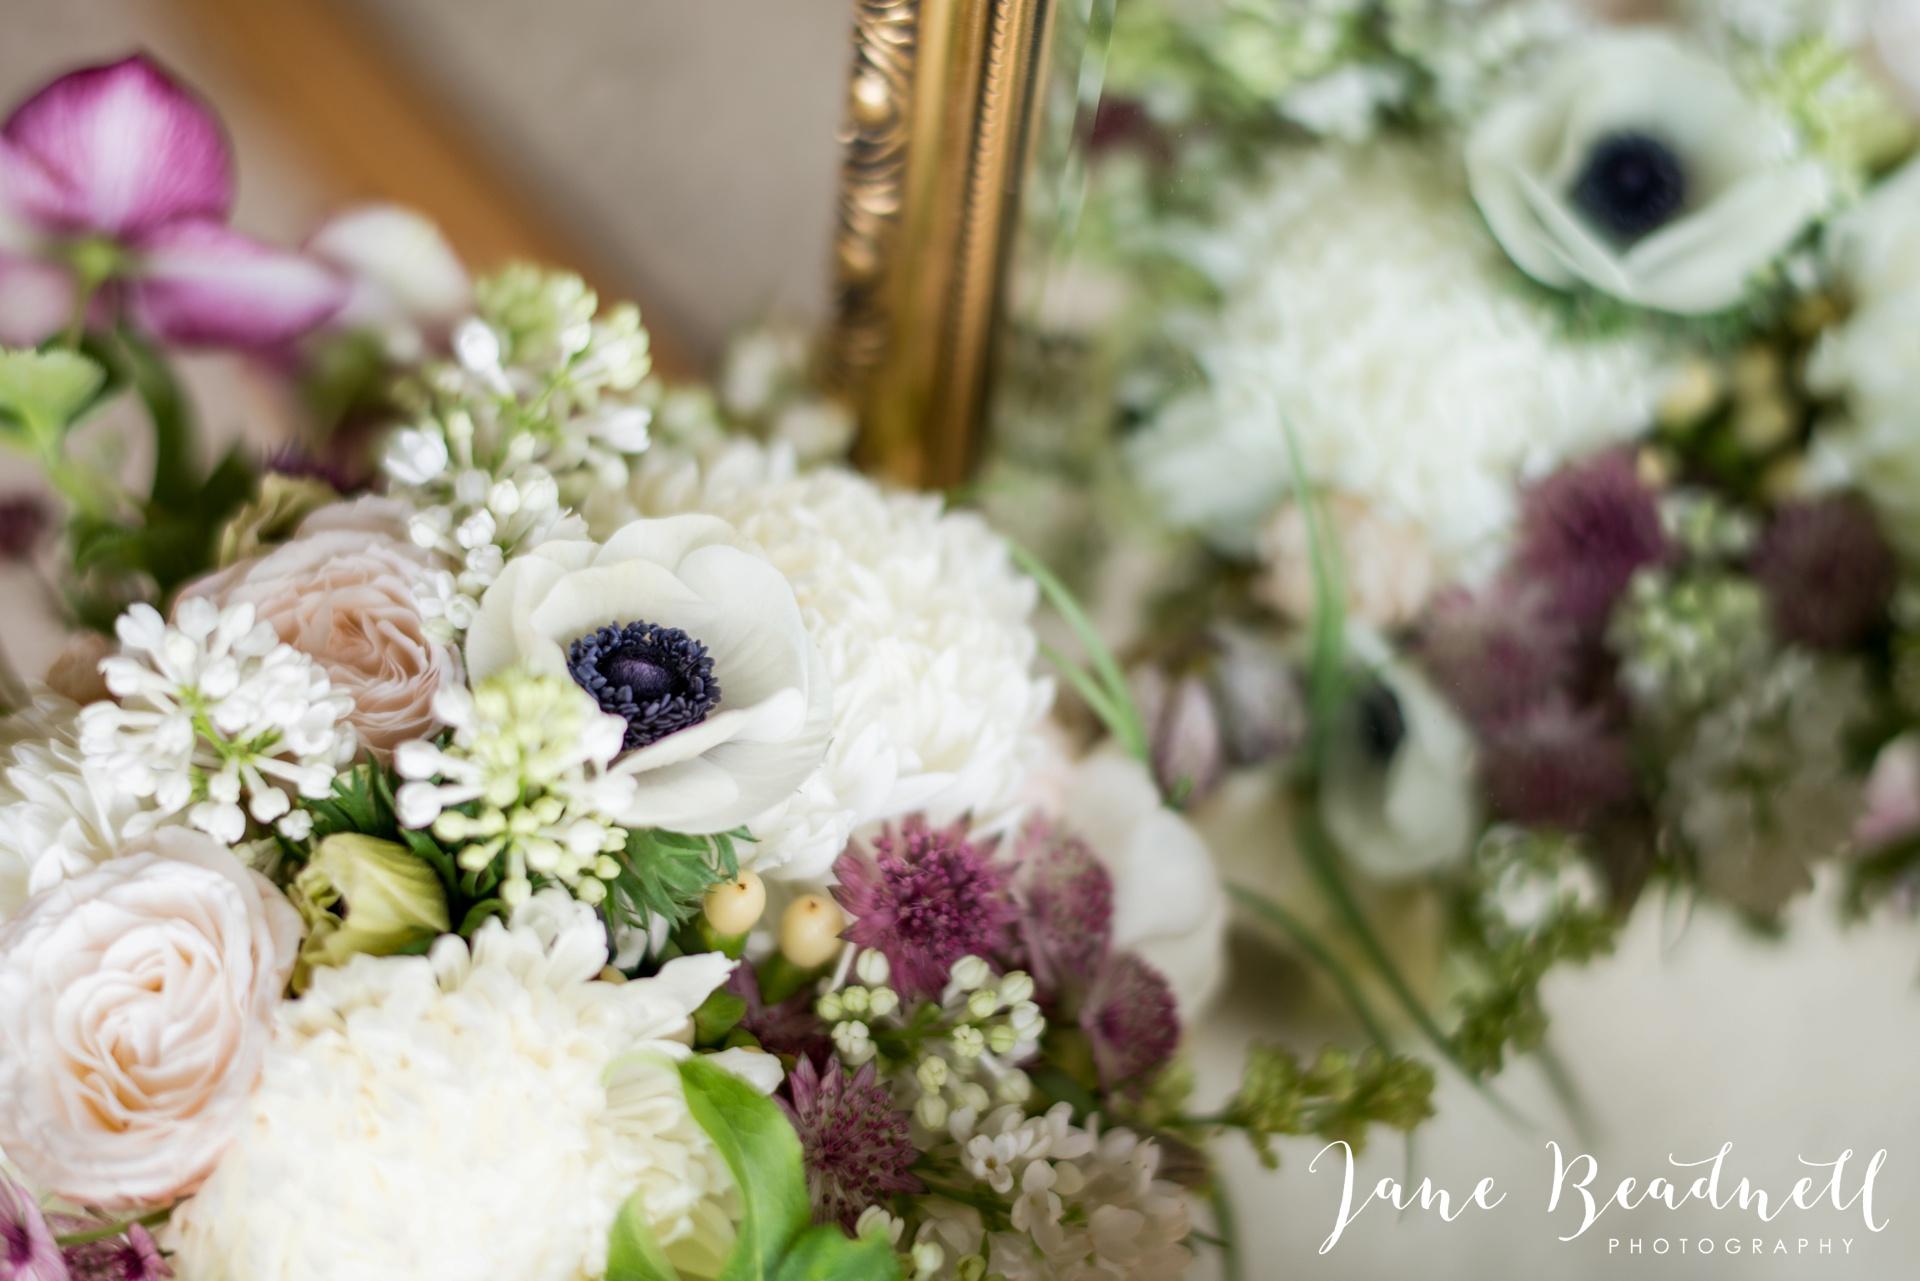 Jane Beadnell fine art wedding photographer Swinton Park23